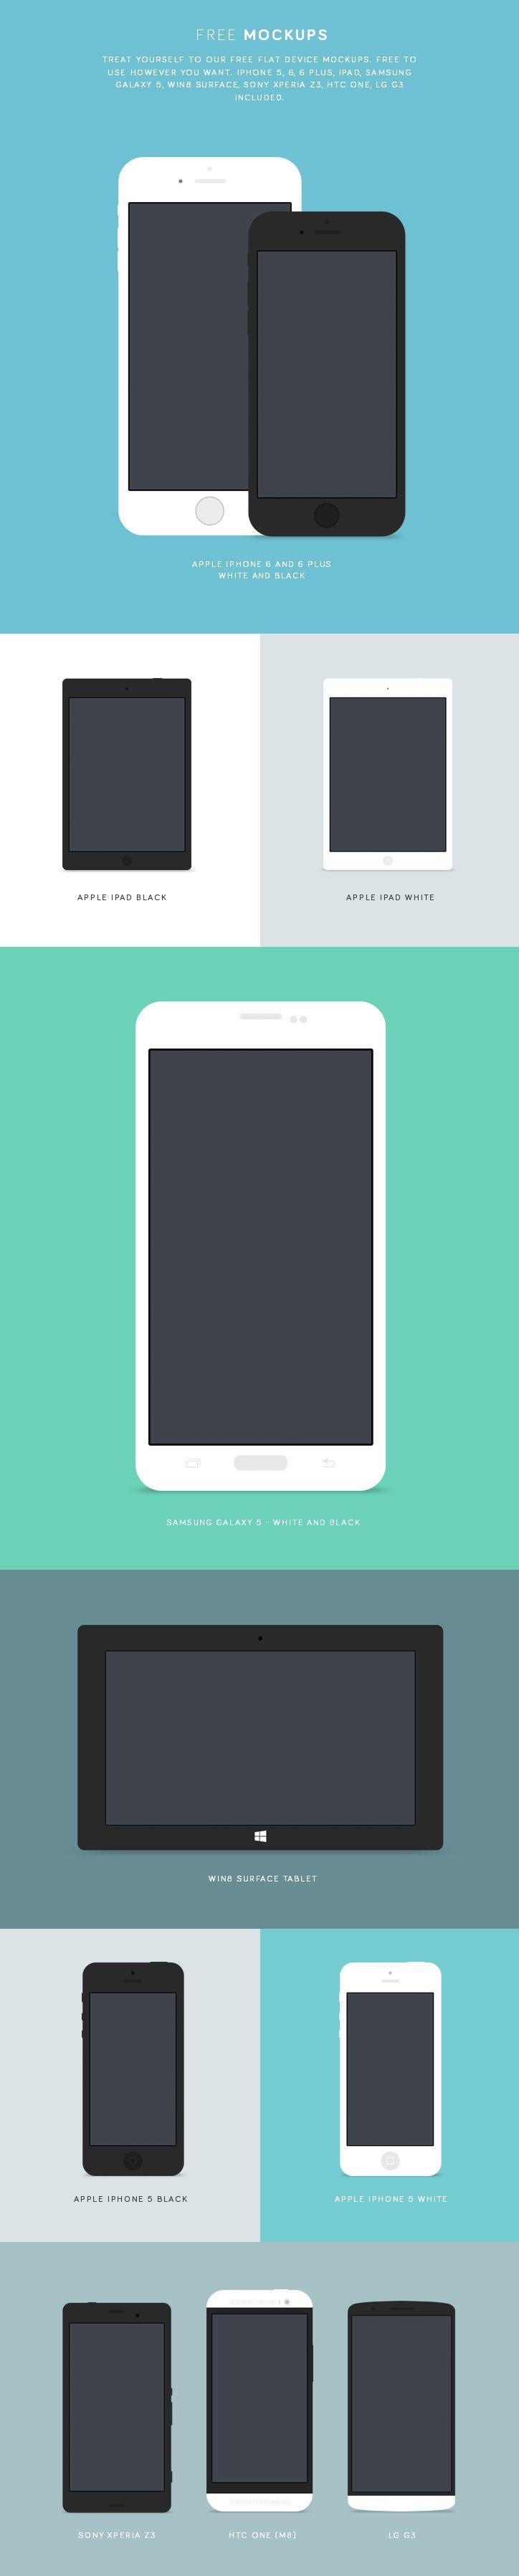 Free Flat Device Mock Ups Mockup Free Psd Mockup Psd Ebook Design